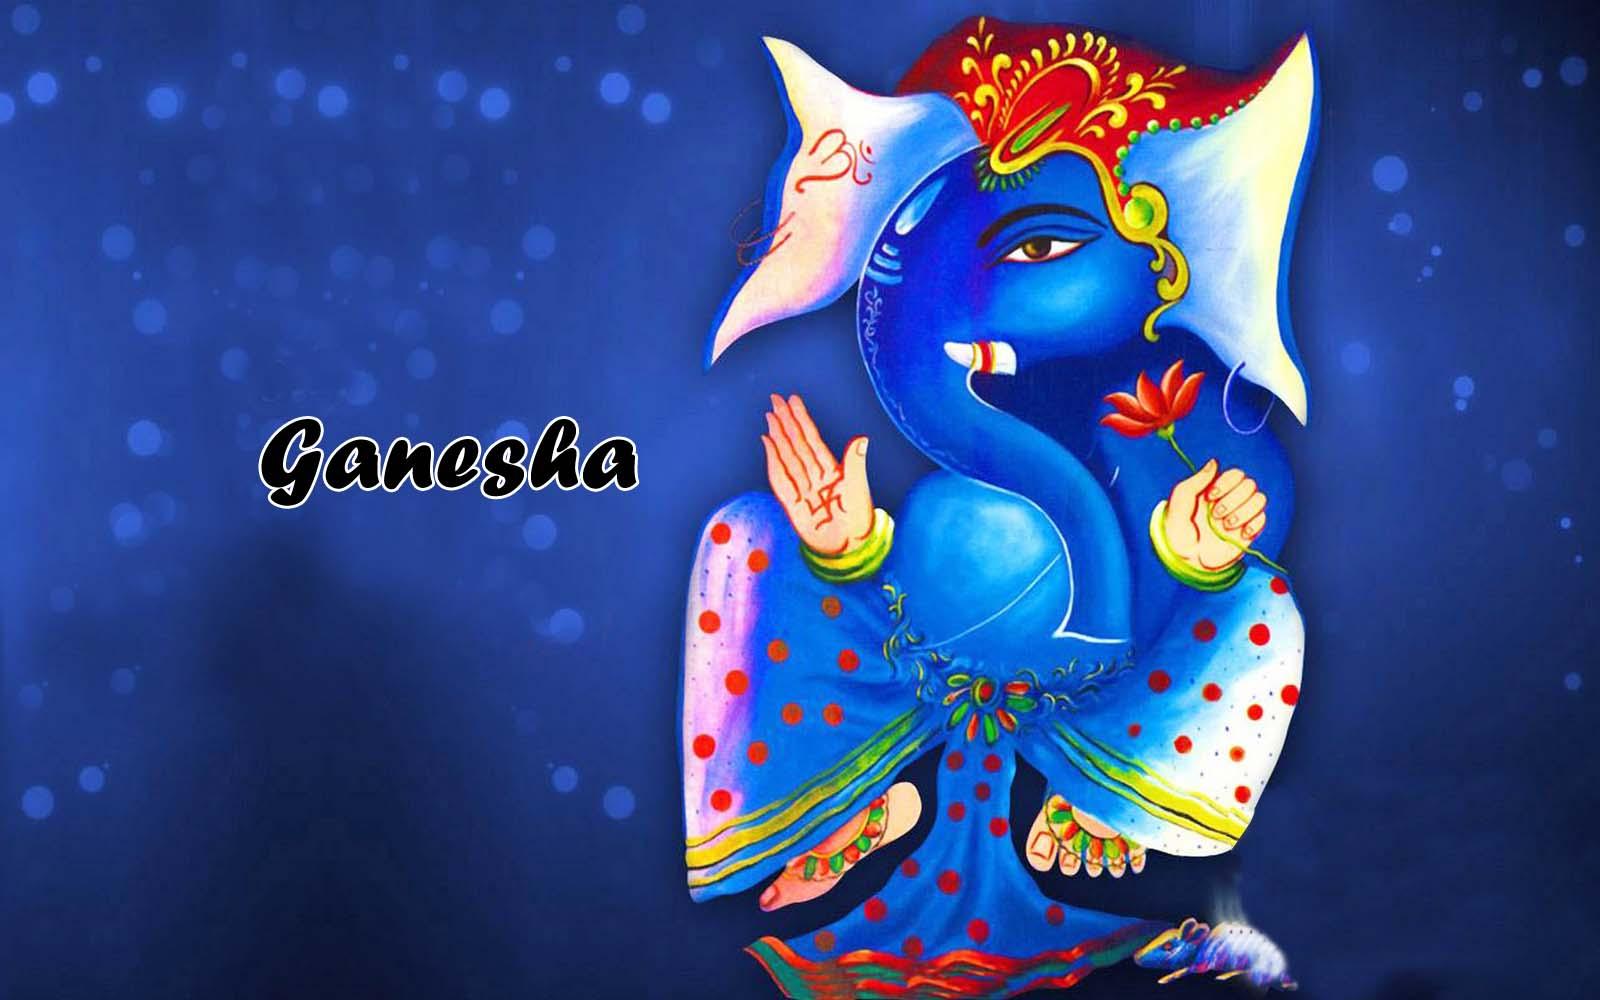 Ganesh Ji Photo Download 2018 Vinnyoleo Vegetalinfo